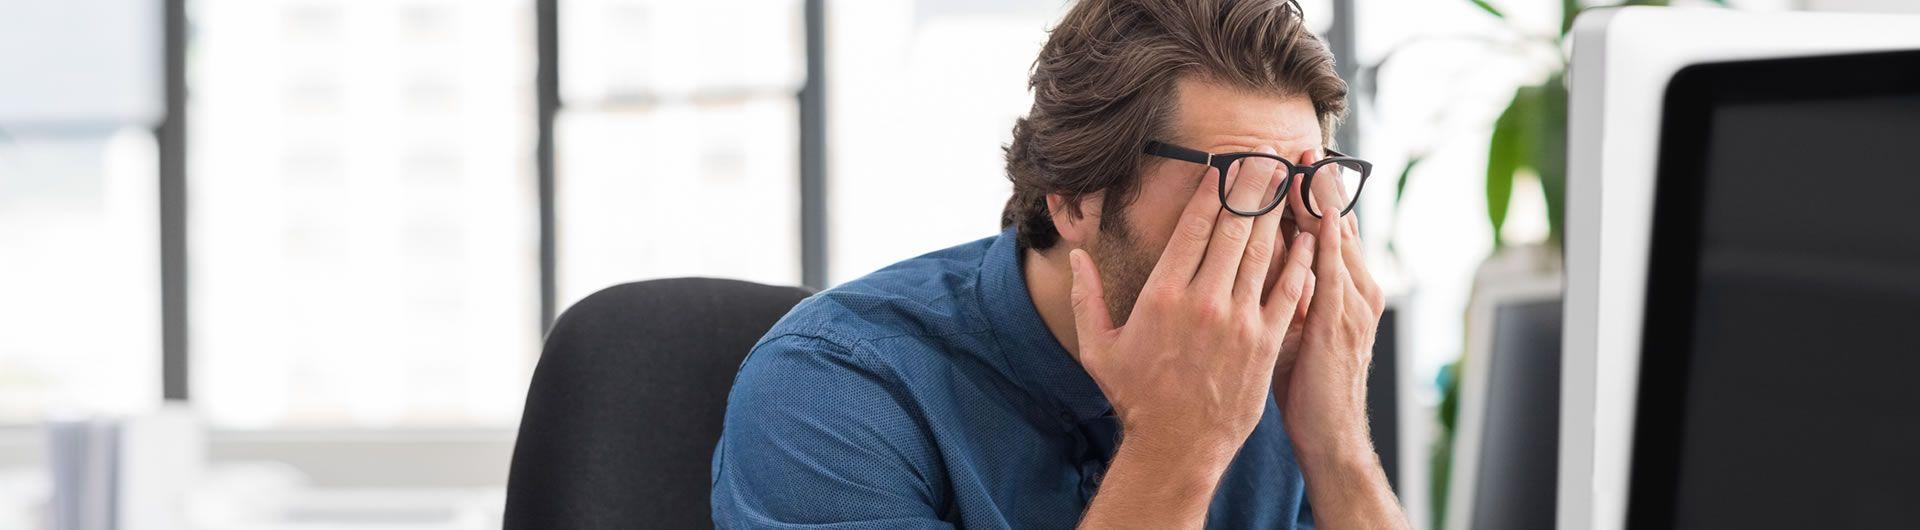 Man at computer stressed at work